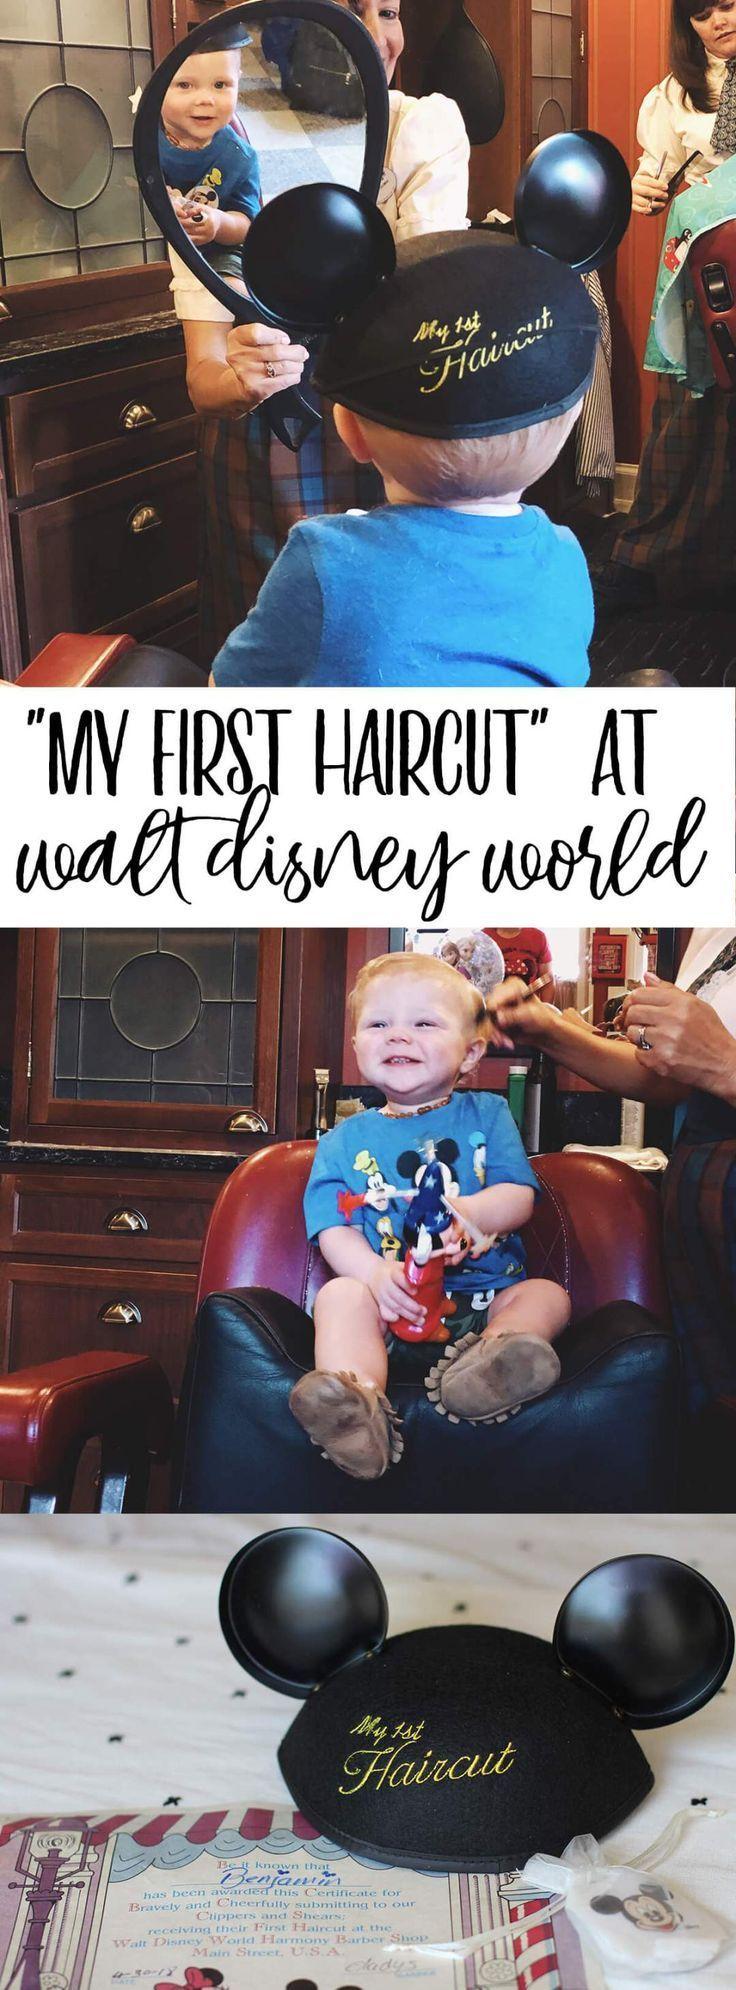 21+ Disney world my first haircut ideas in 2021